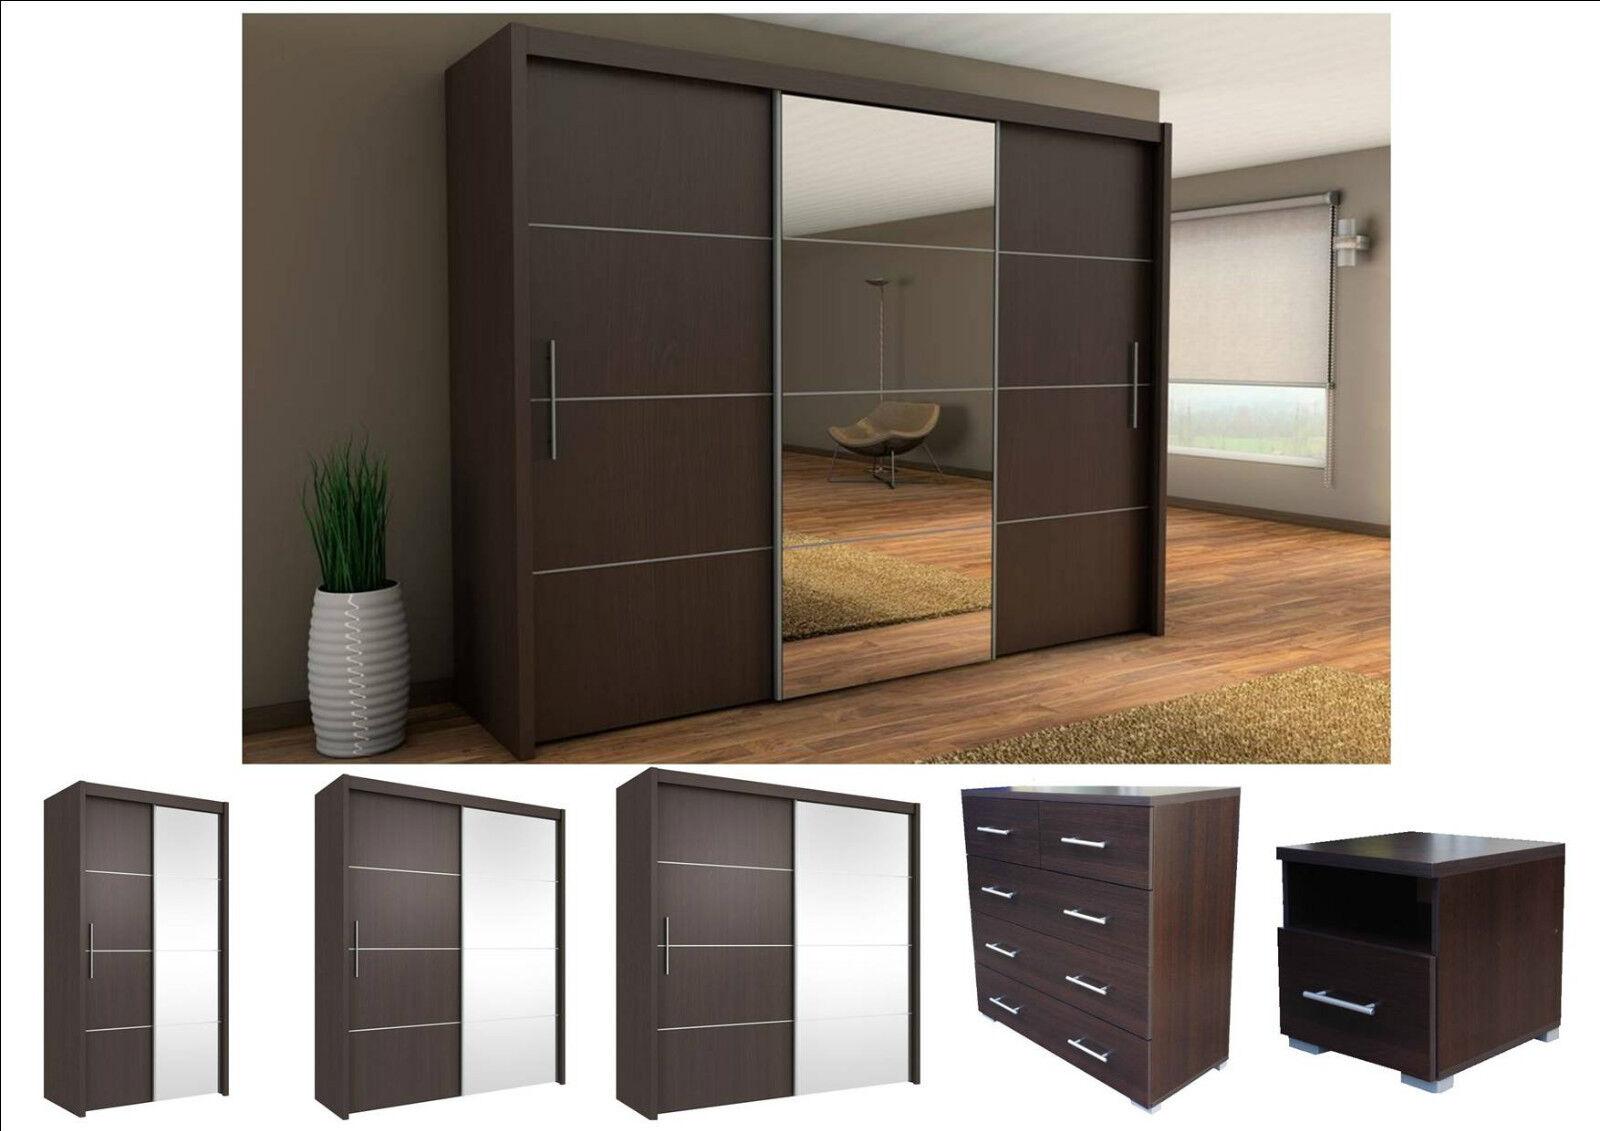 Inova Sliding Door Wardrobe Wenge Bedroom Furniture Bedside Chest Of Drawers